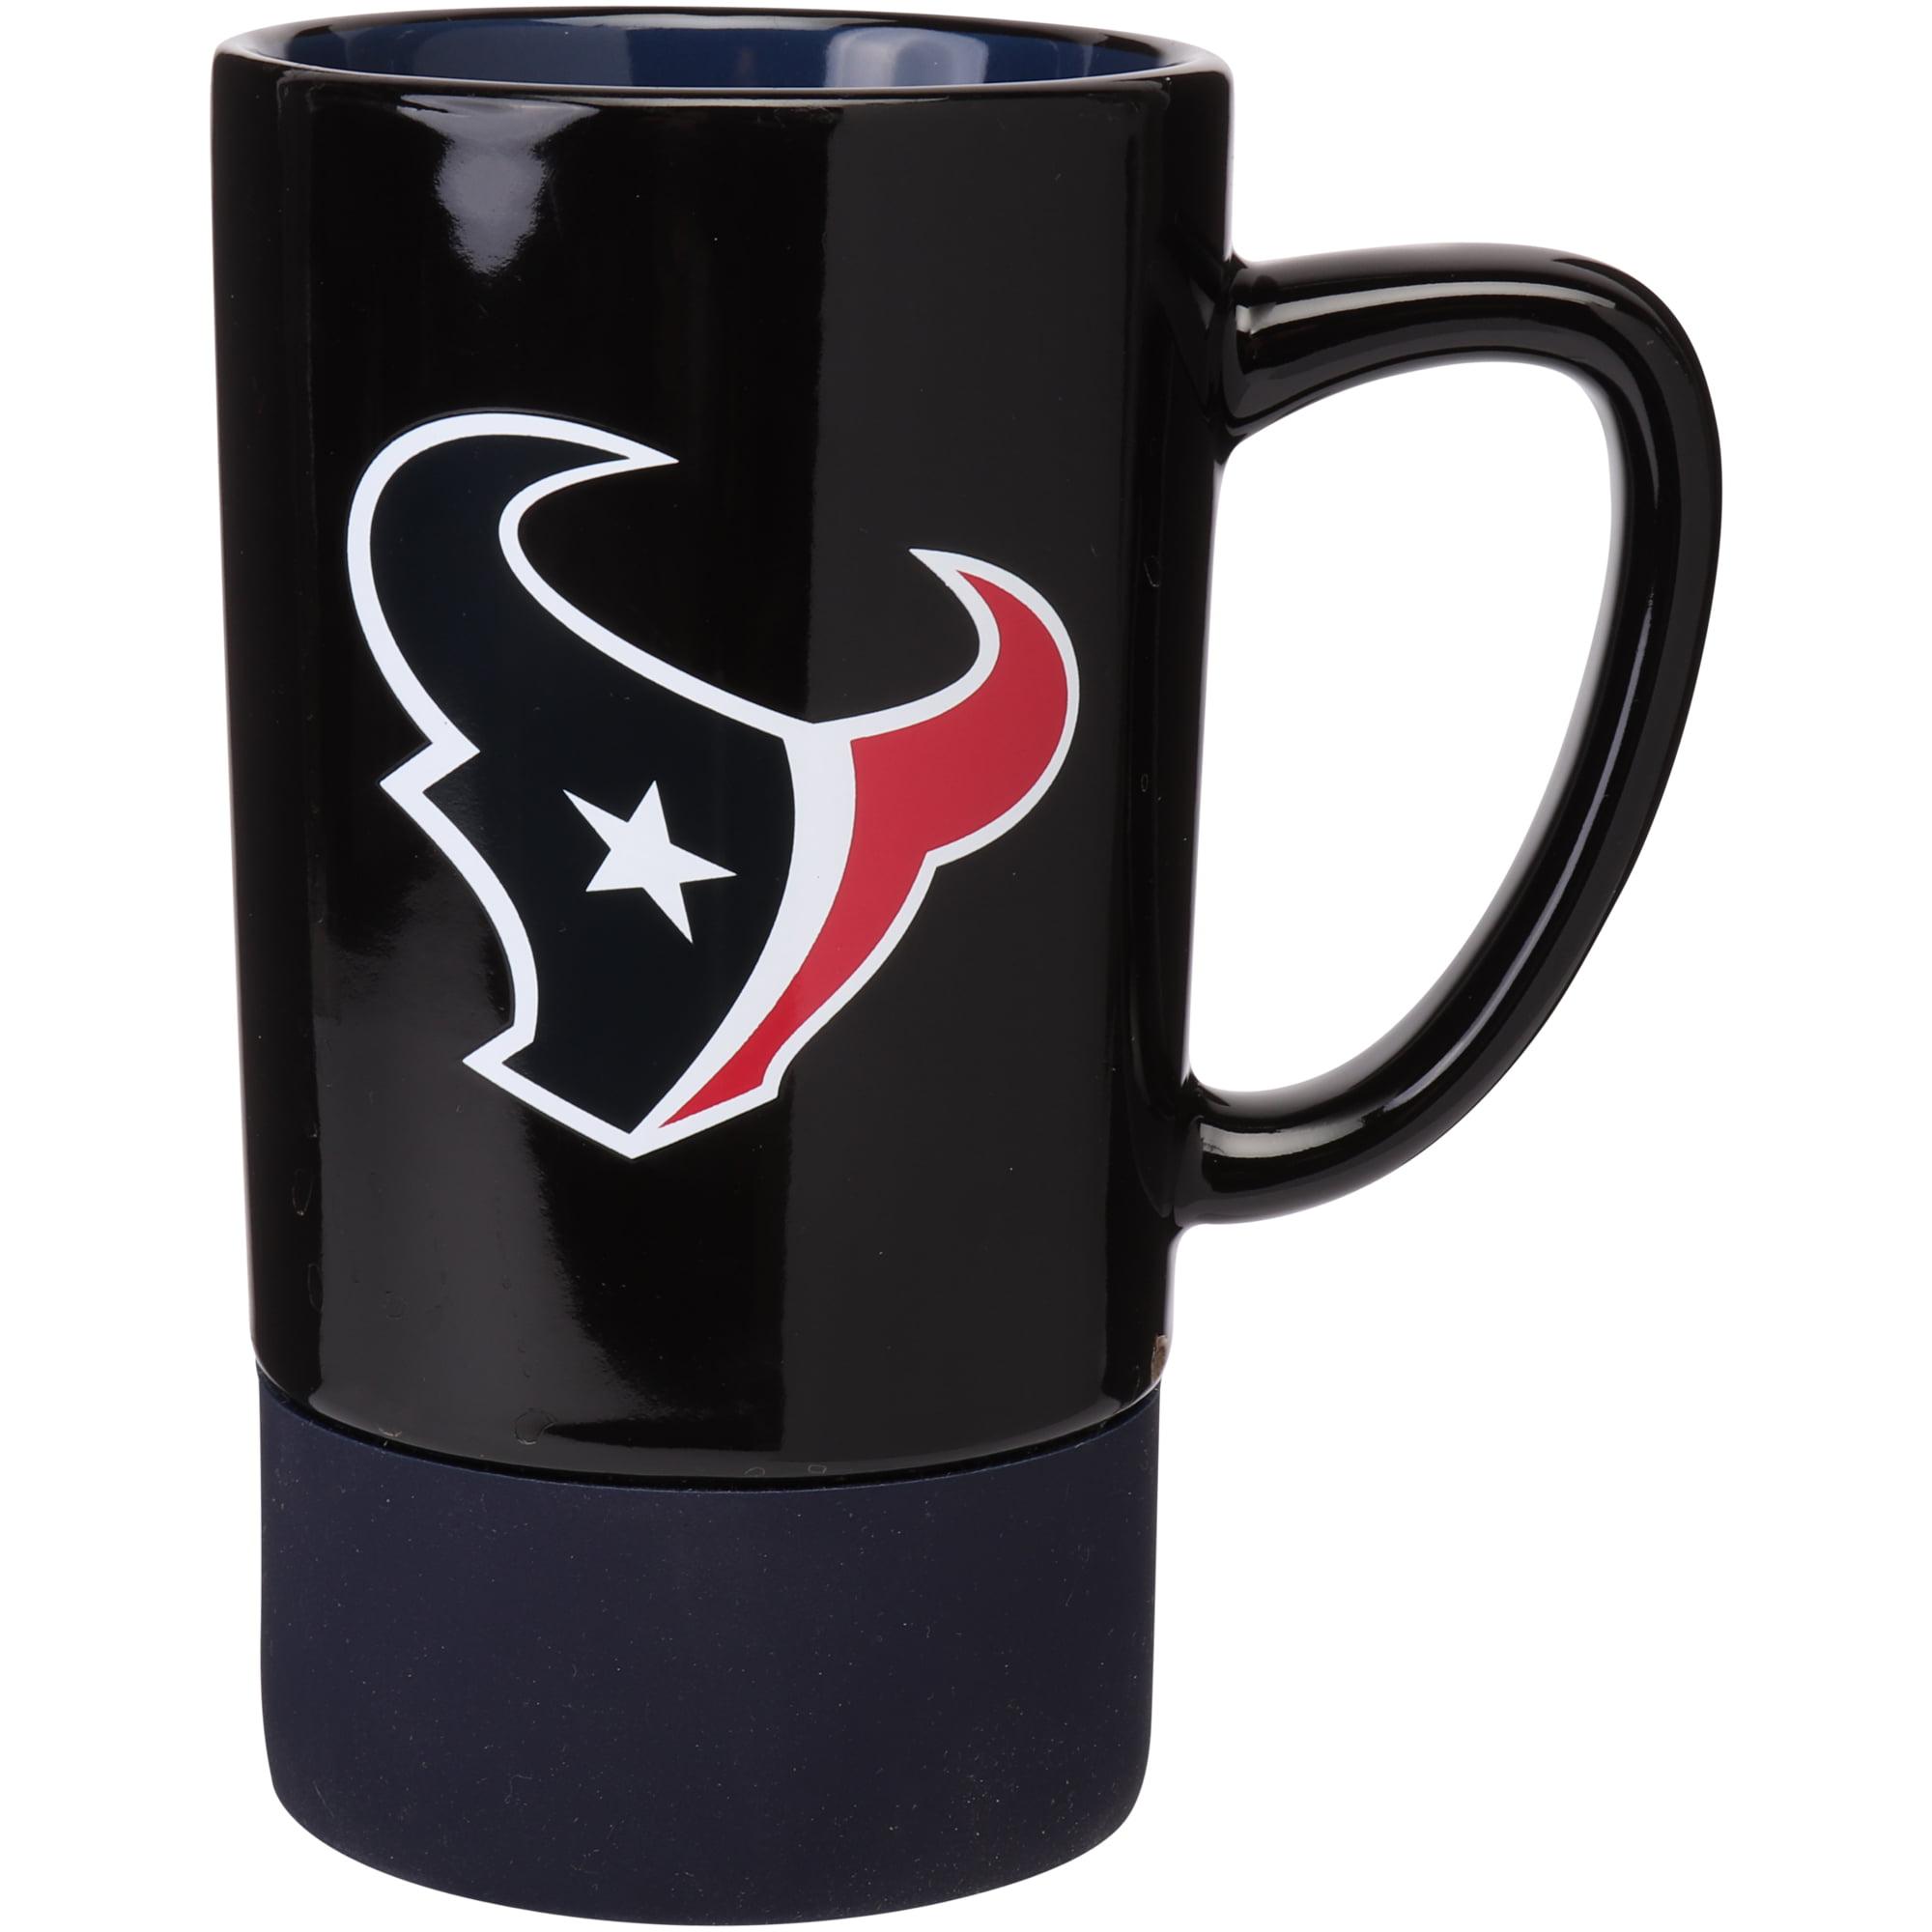 Houston Texans 16oz. Coaster Mug - No Size